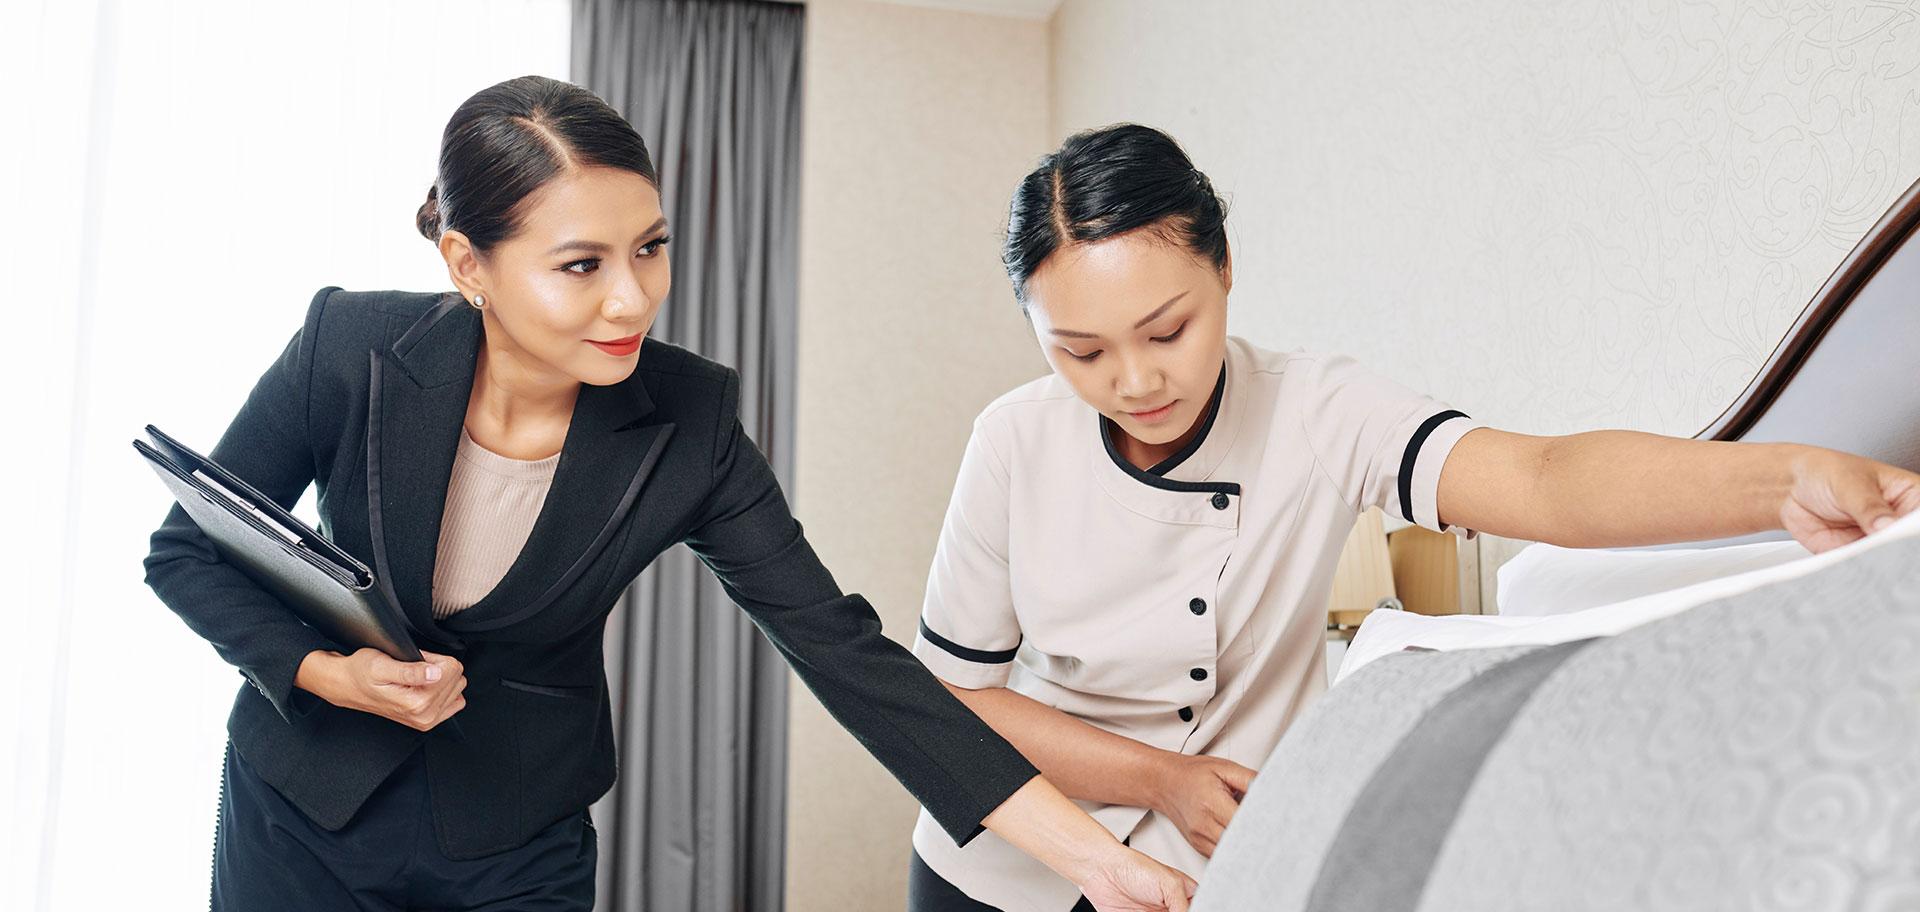 Footer-Executive-Housekeeper-housekeeper